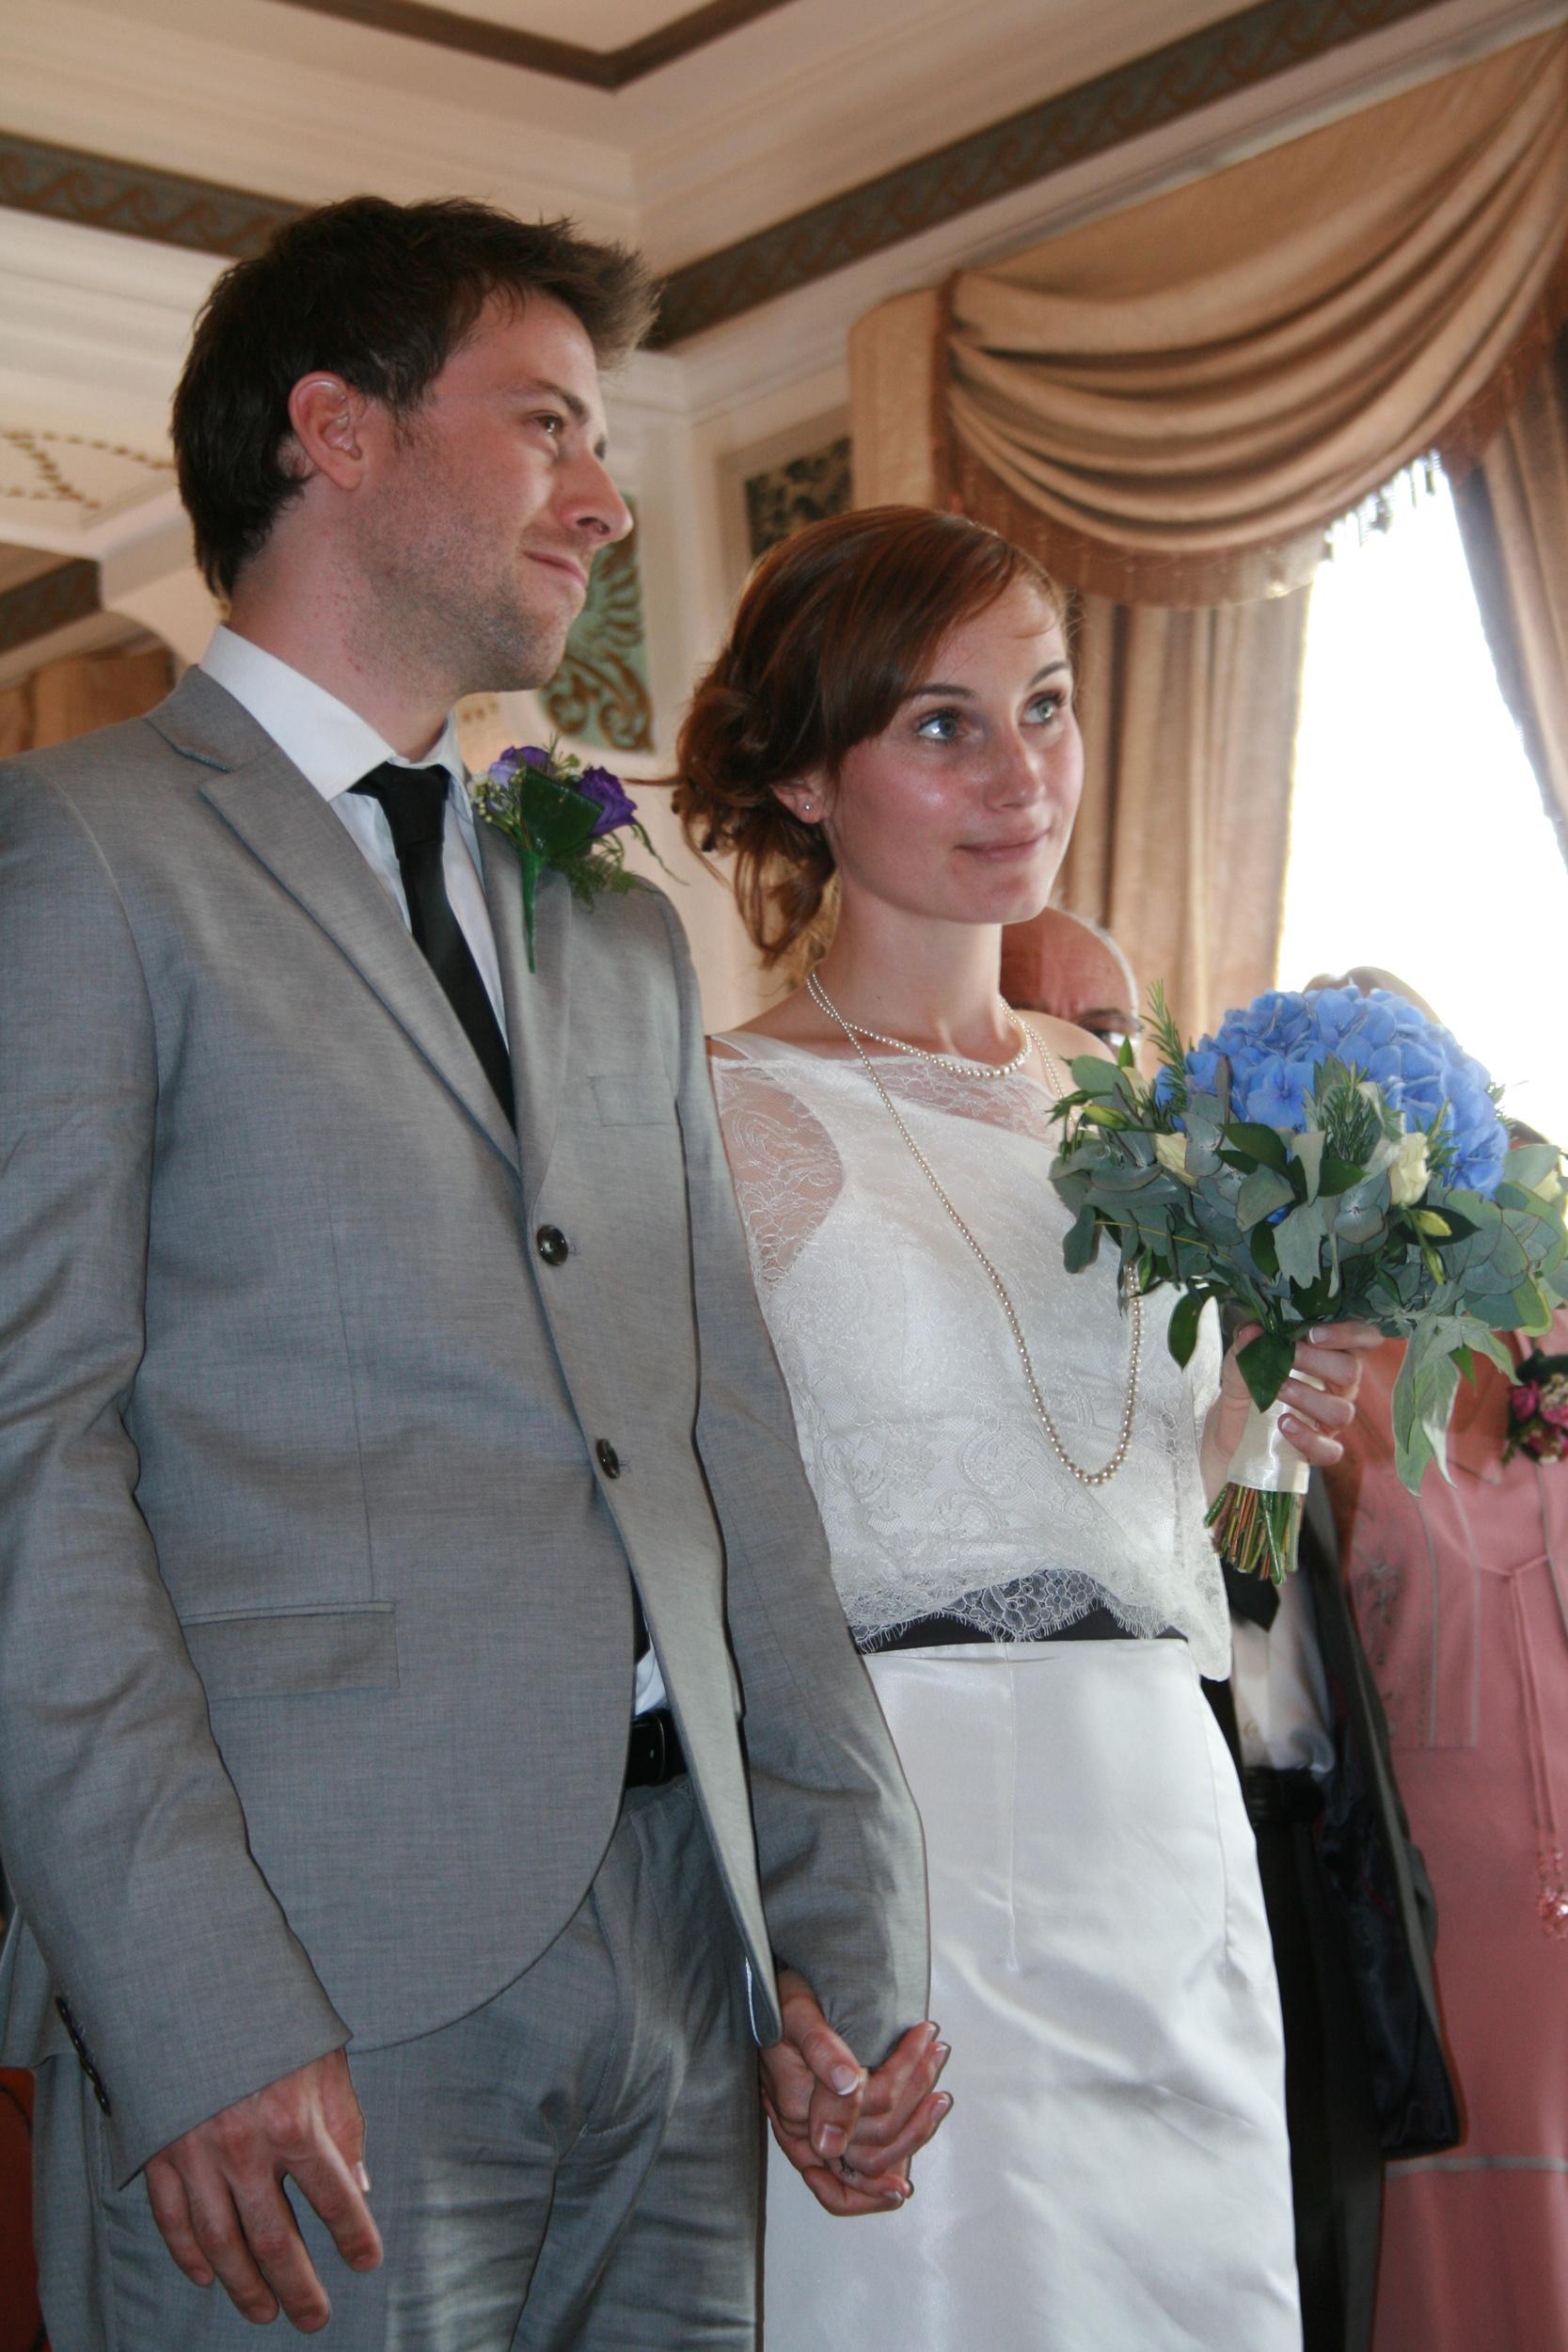 Alexandra-bespoke-wedding-dress-Kate-Beaumont-3.jpg